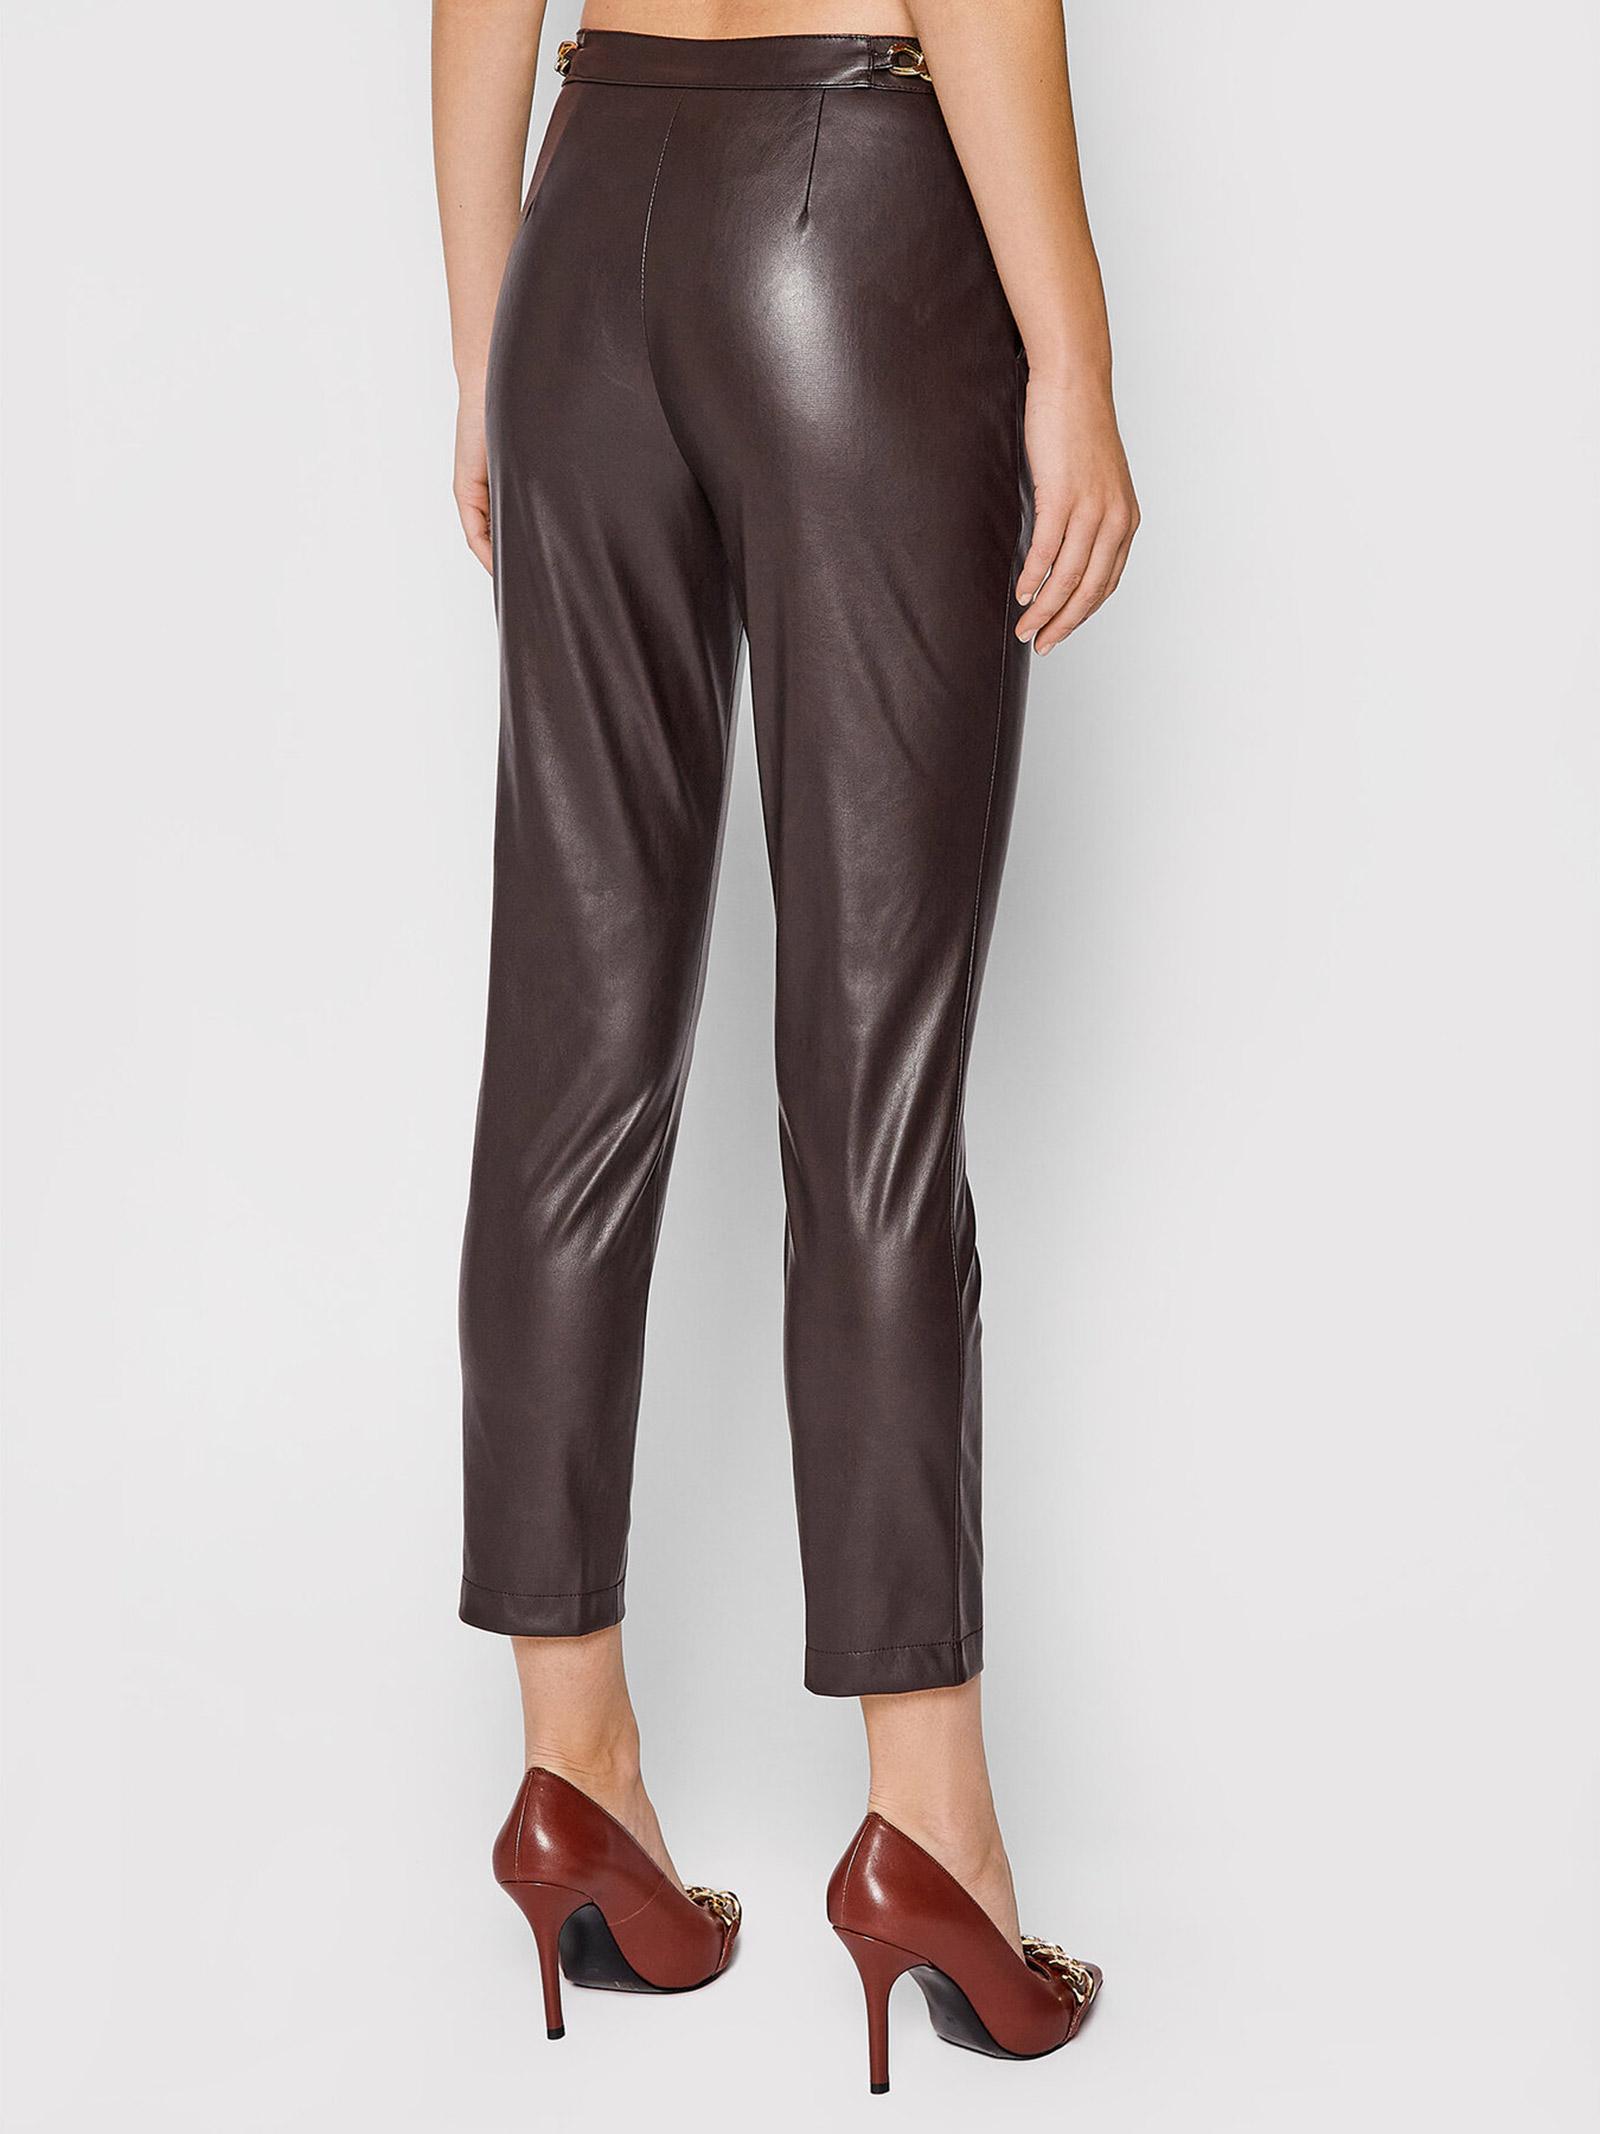 pantaloni new york gloss LIU JO | Pantaloni | CF1011E0641X0385